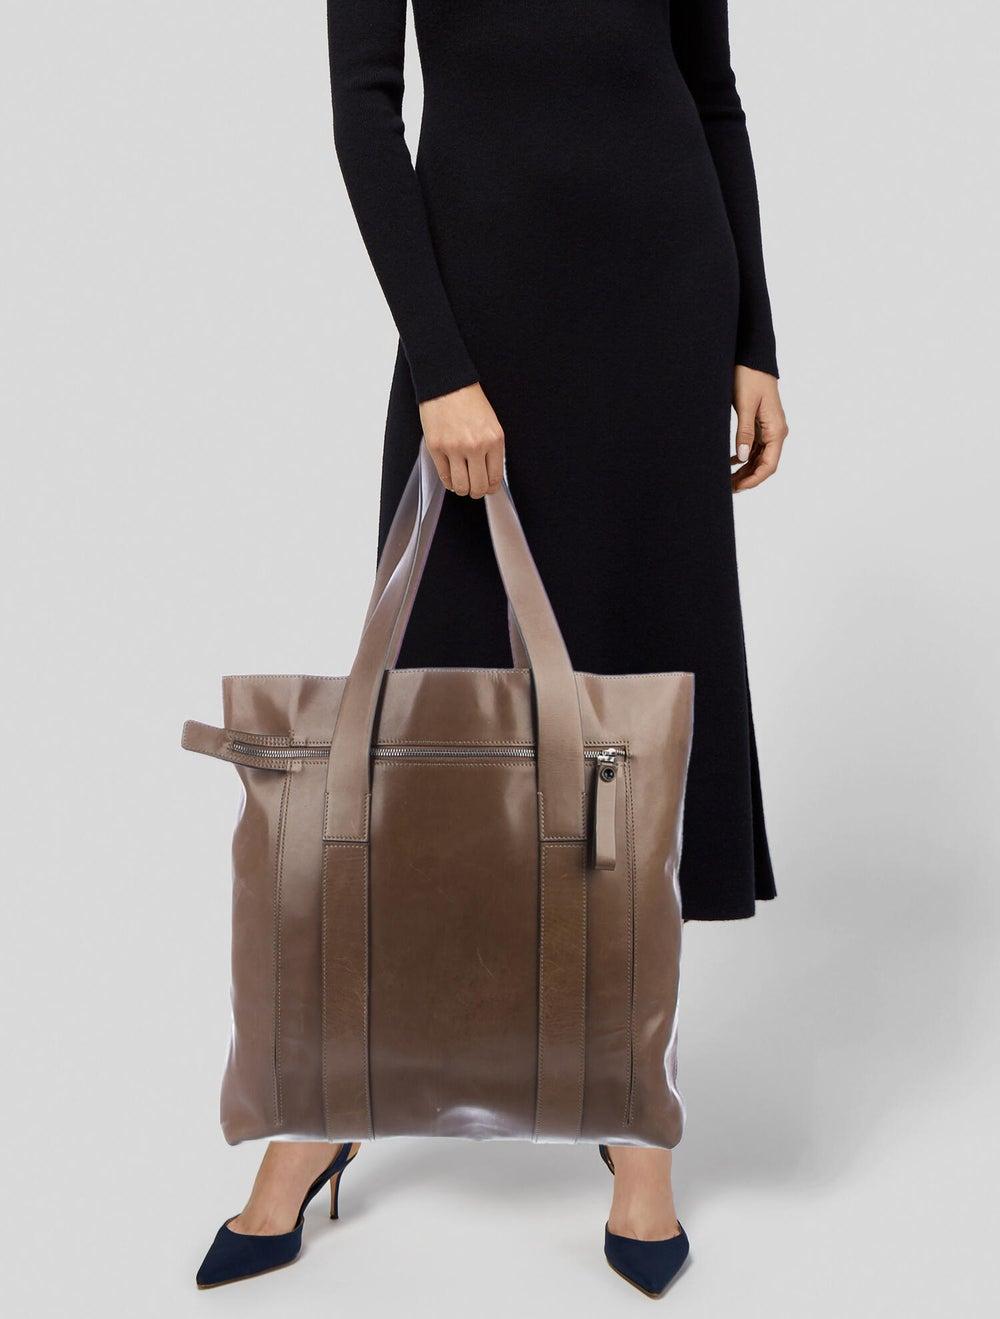 Marni Leather Tote Brown - image 2